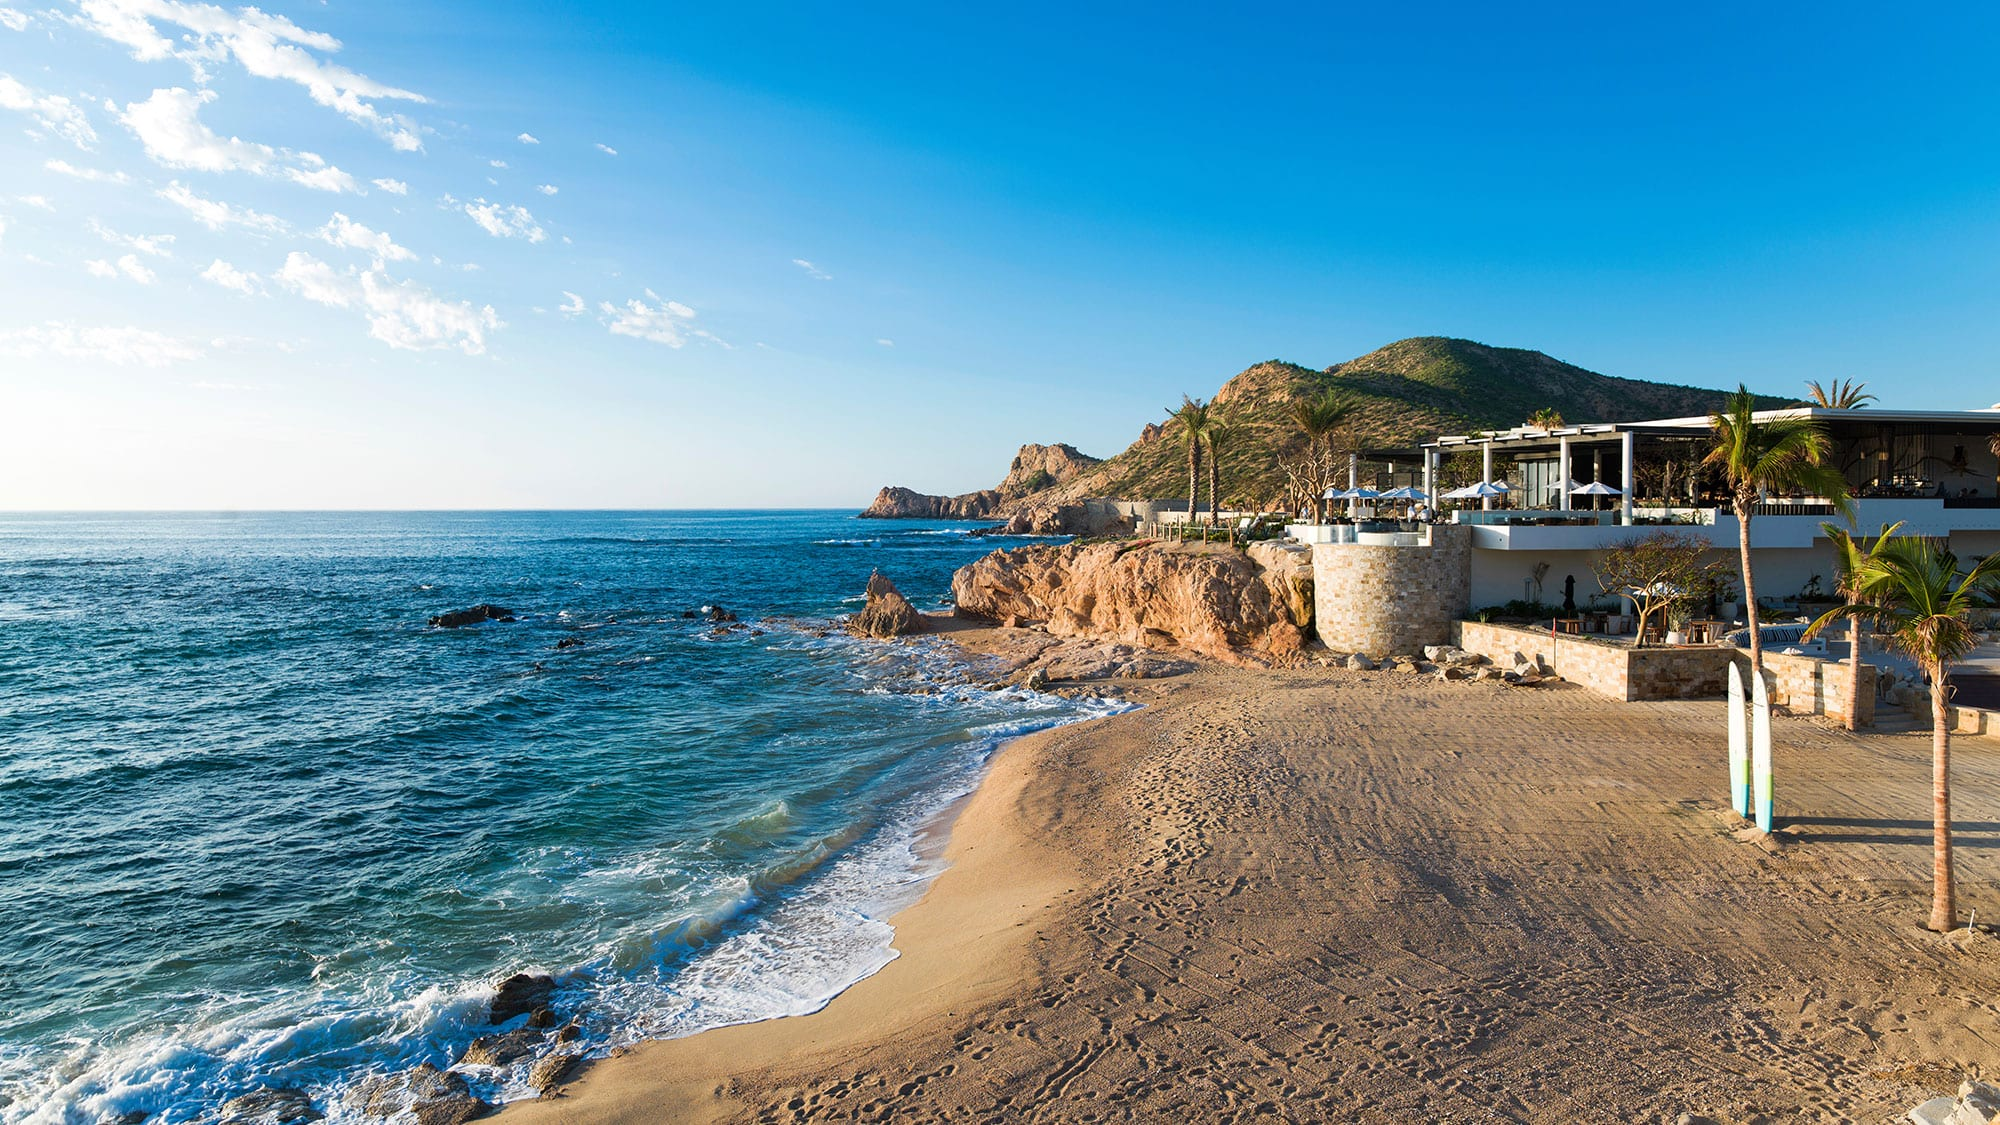 resort view on the beach